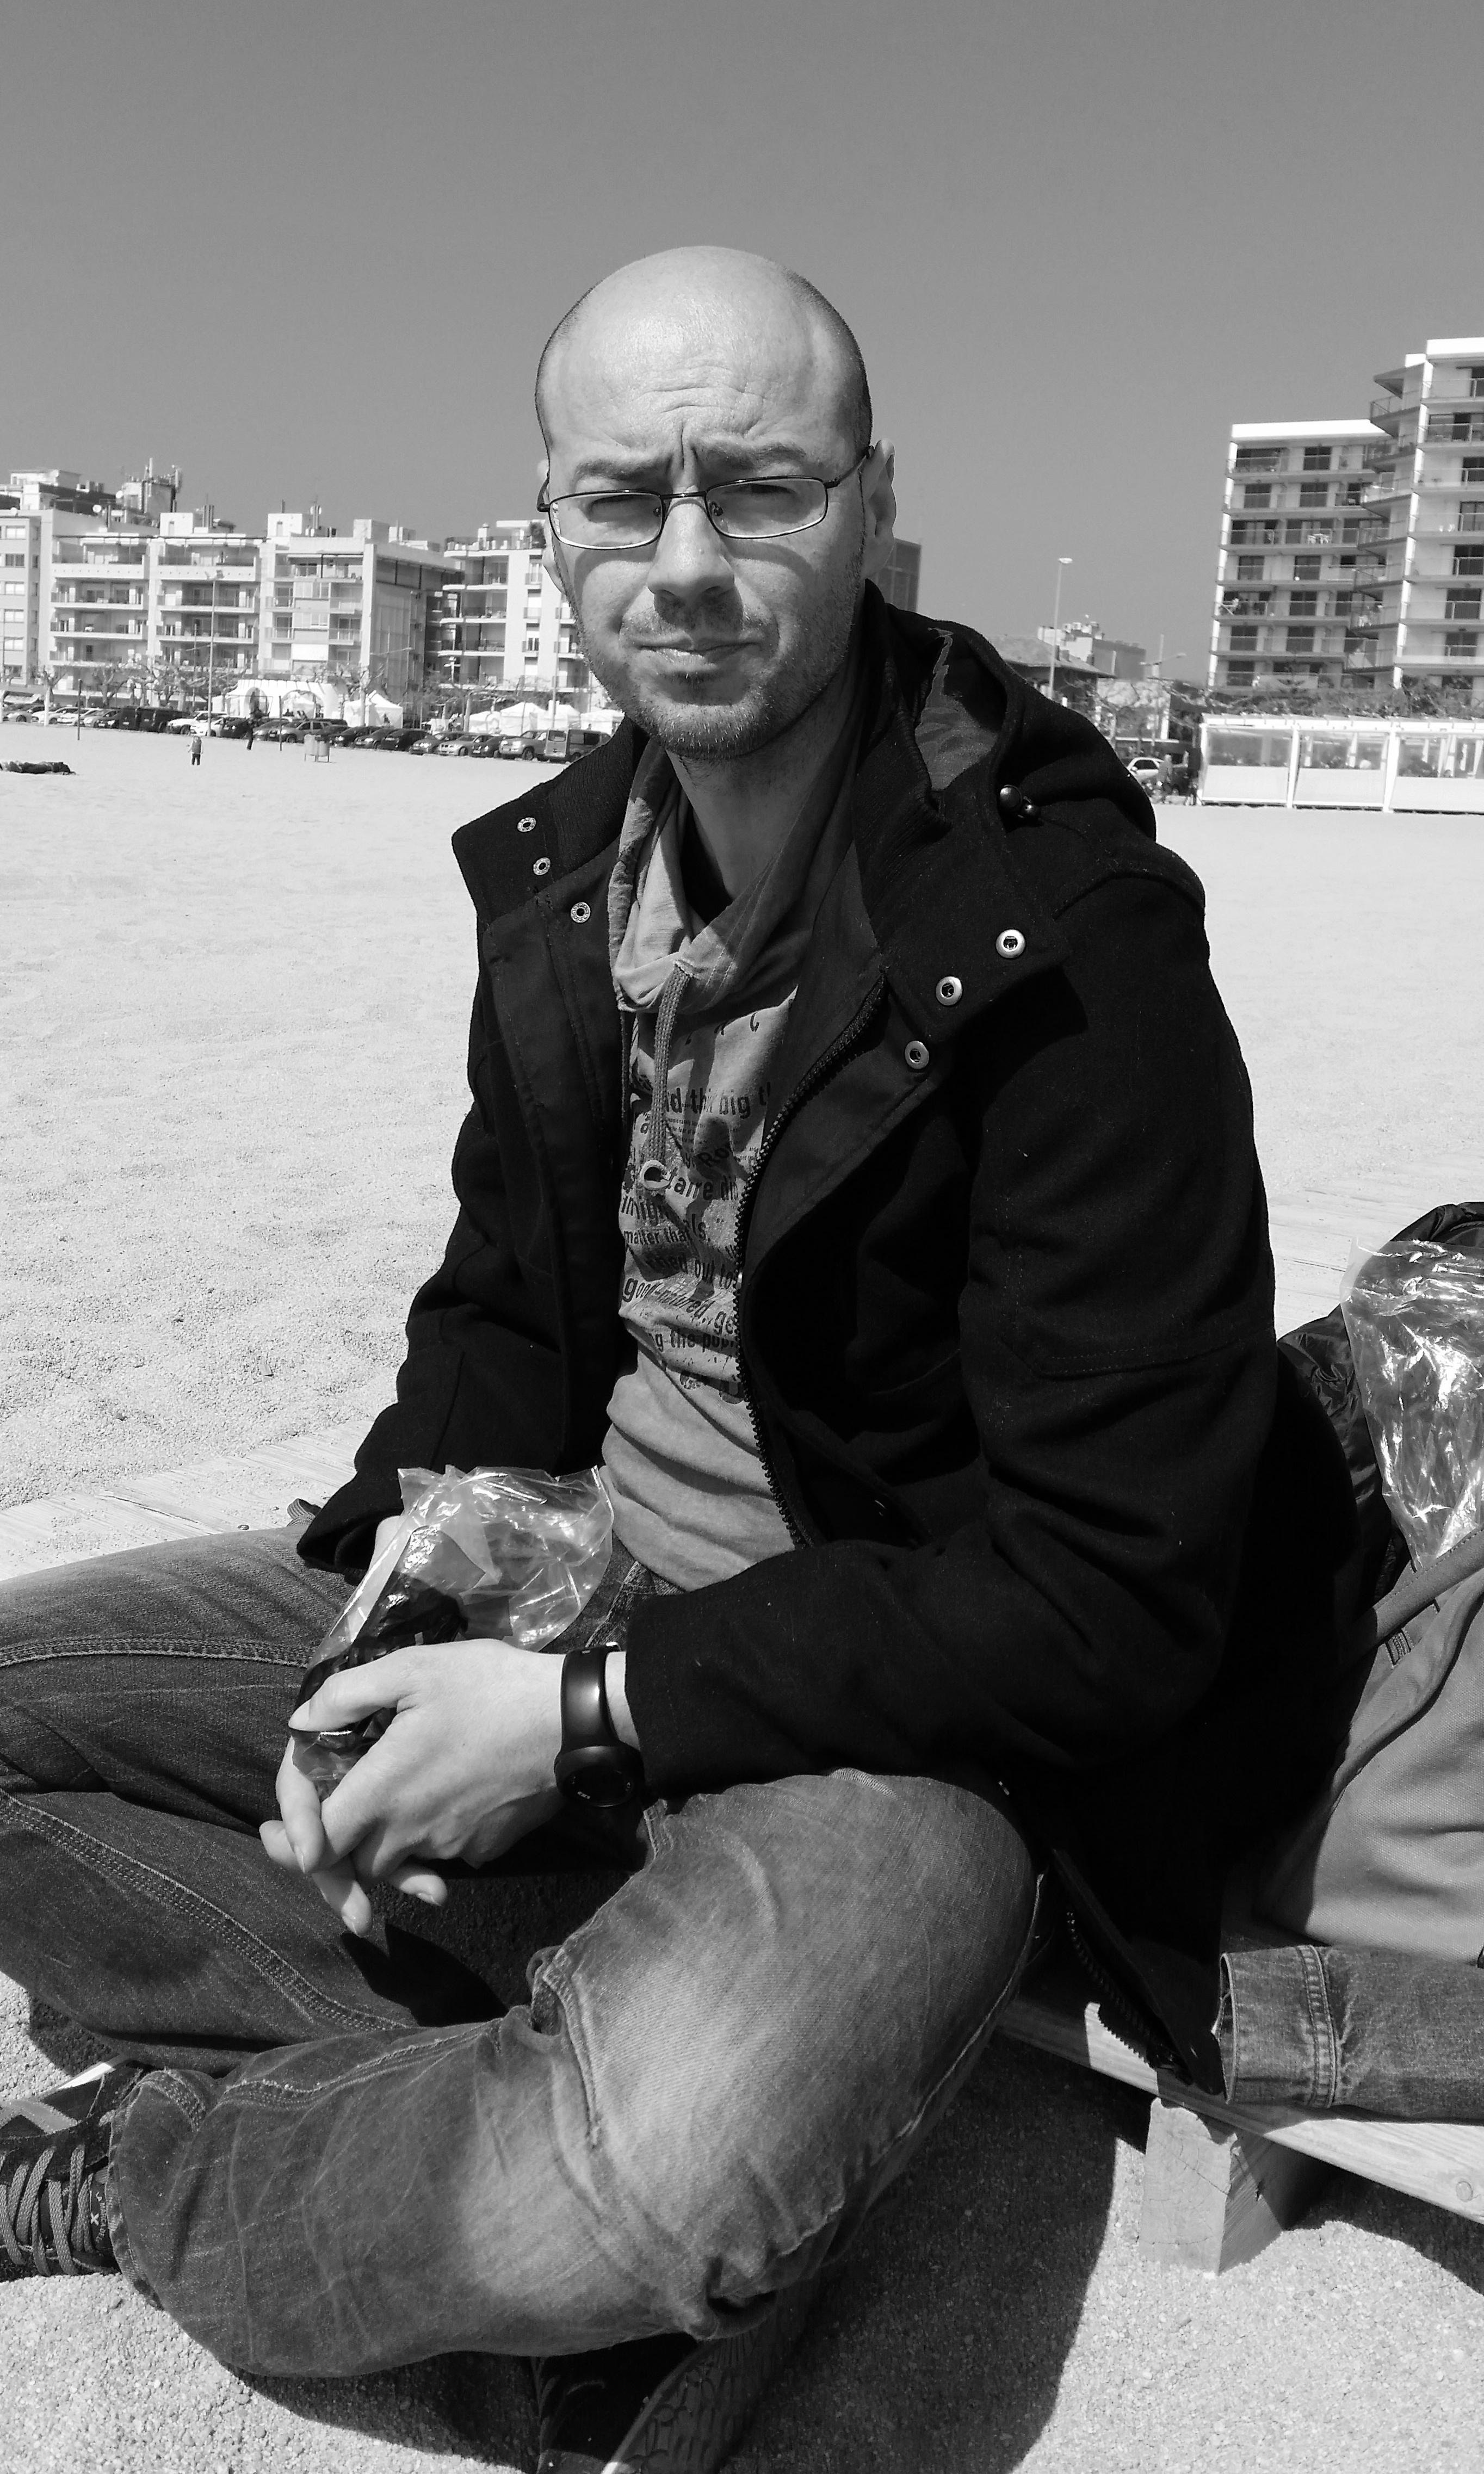 Me llamo Jordi Hernando